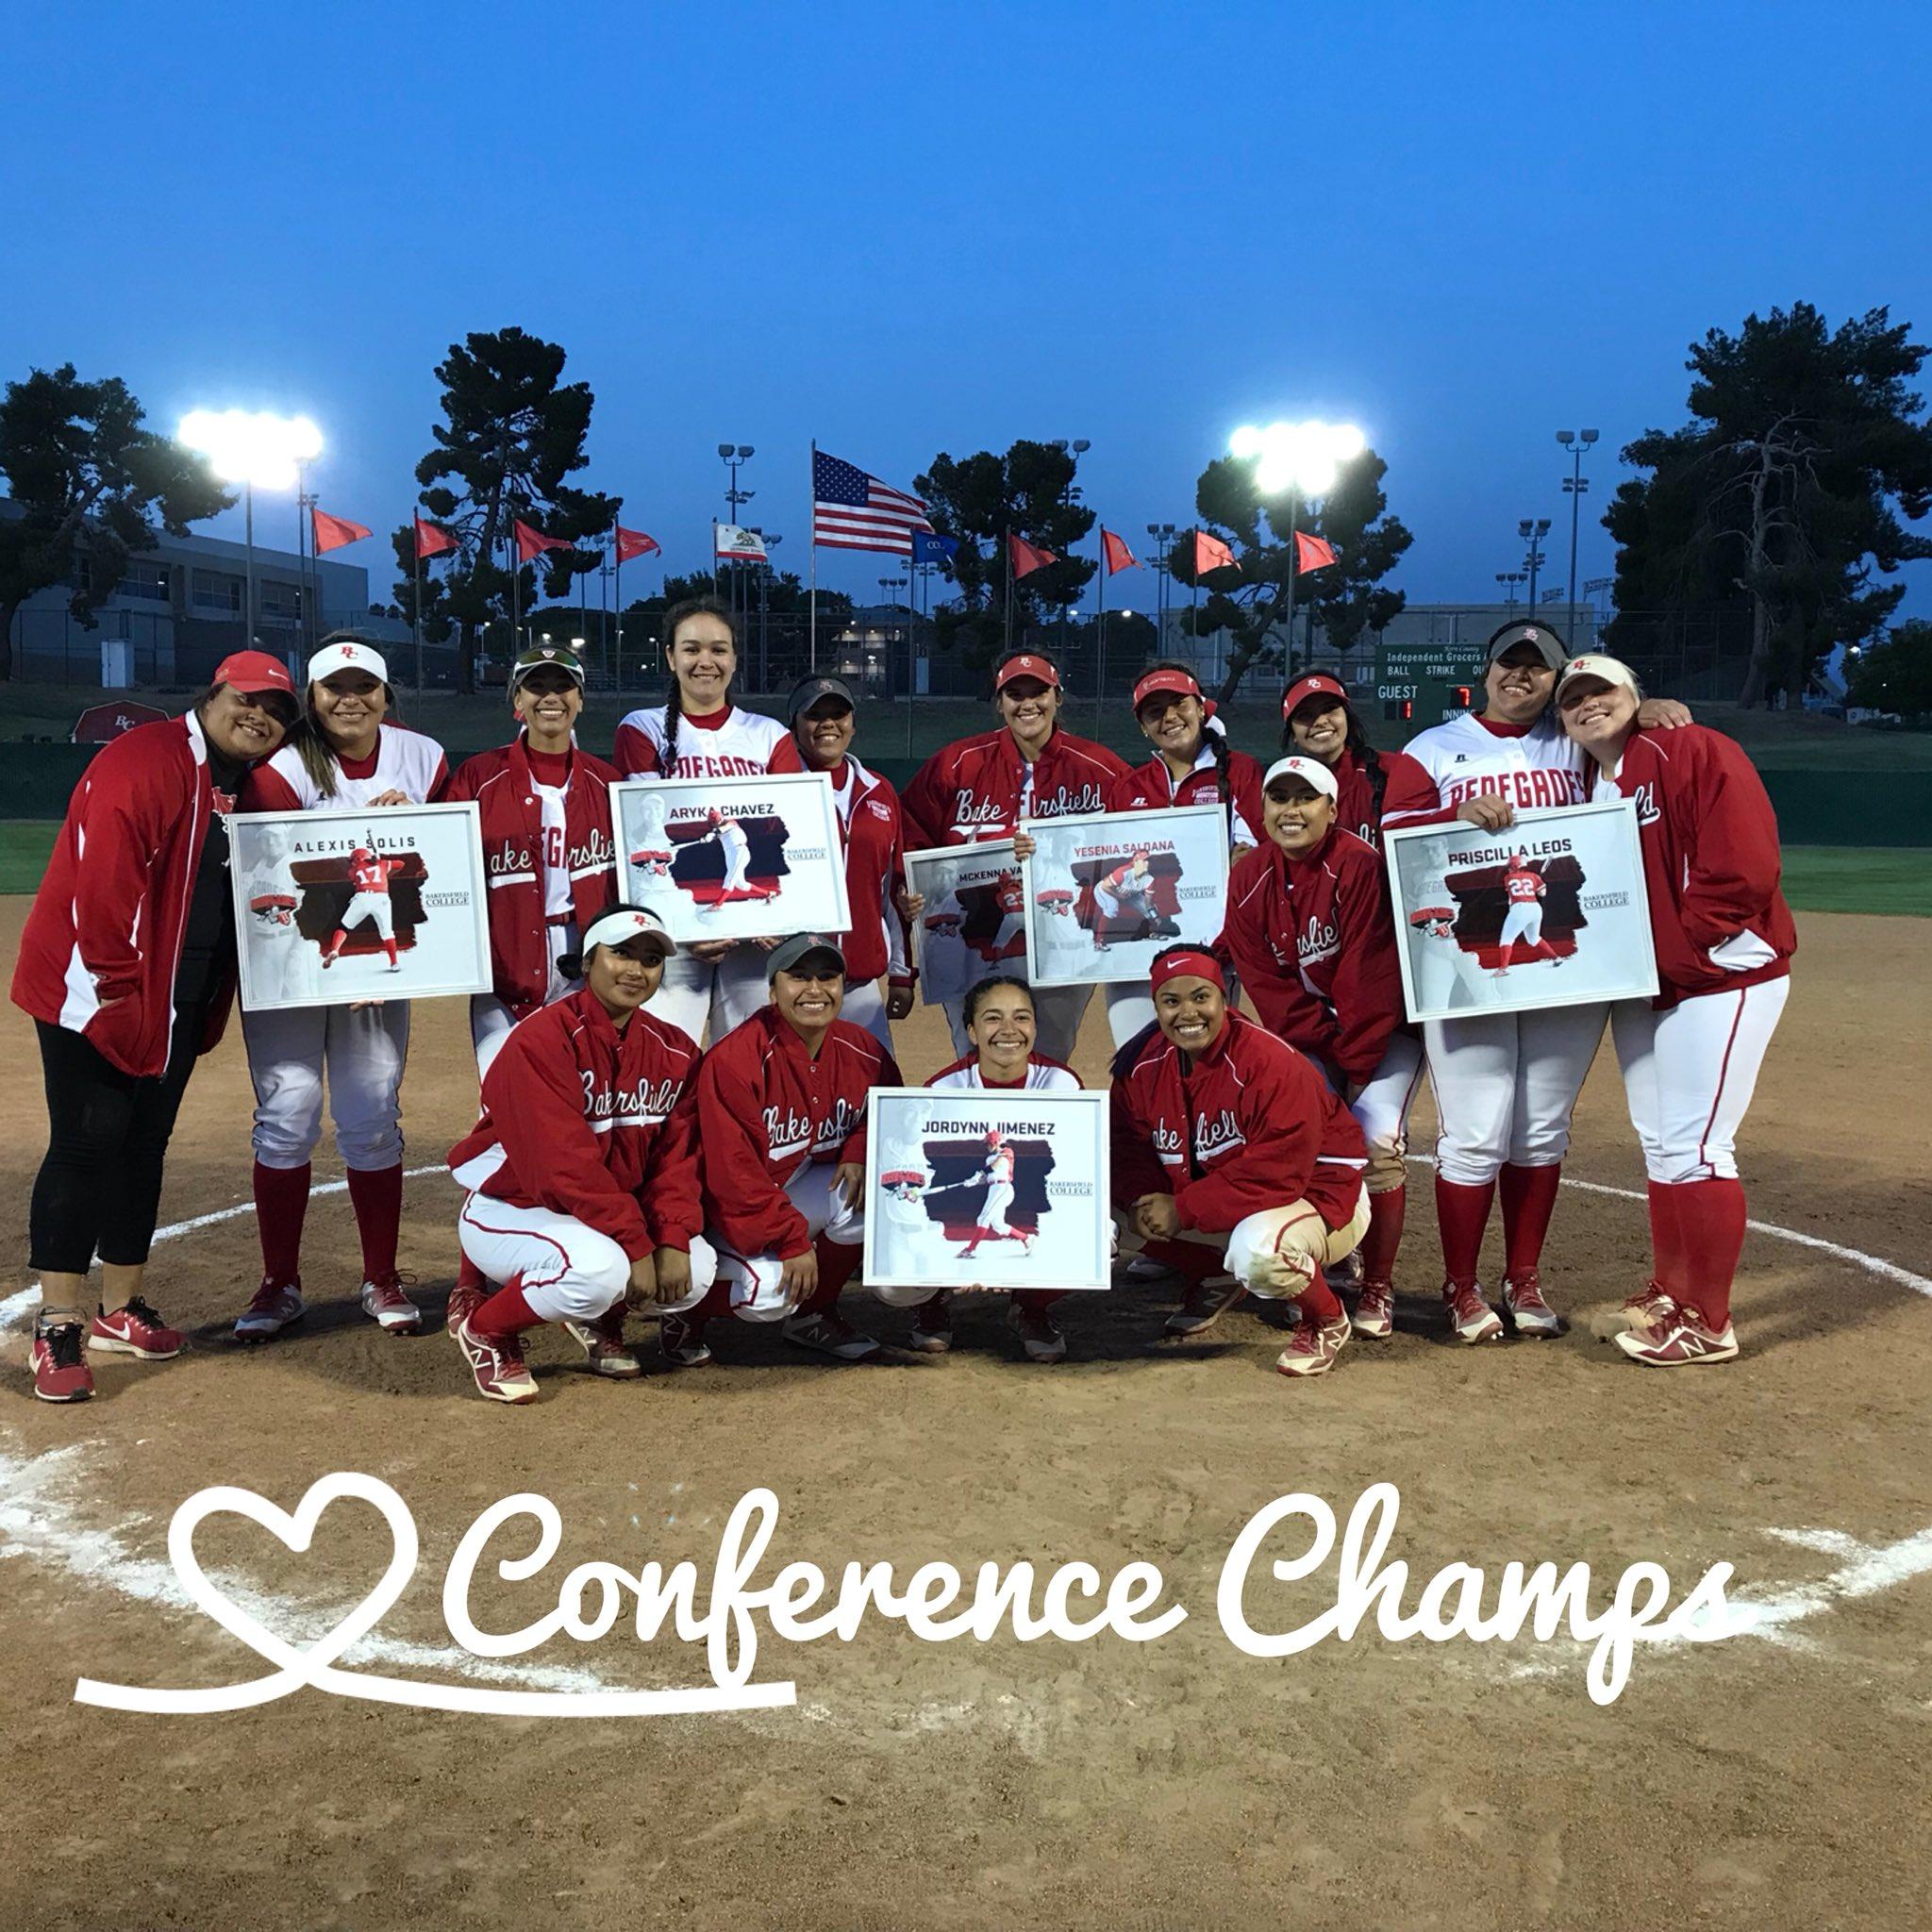 Softball conference champions April 19 2018